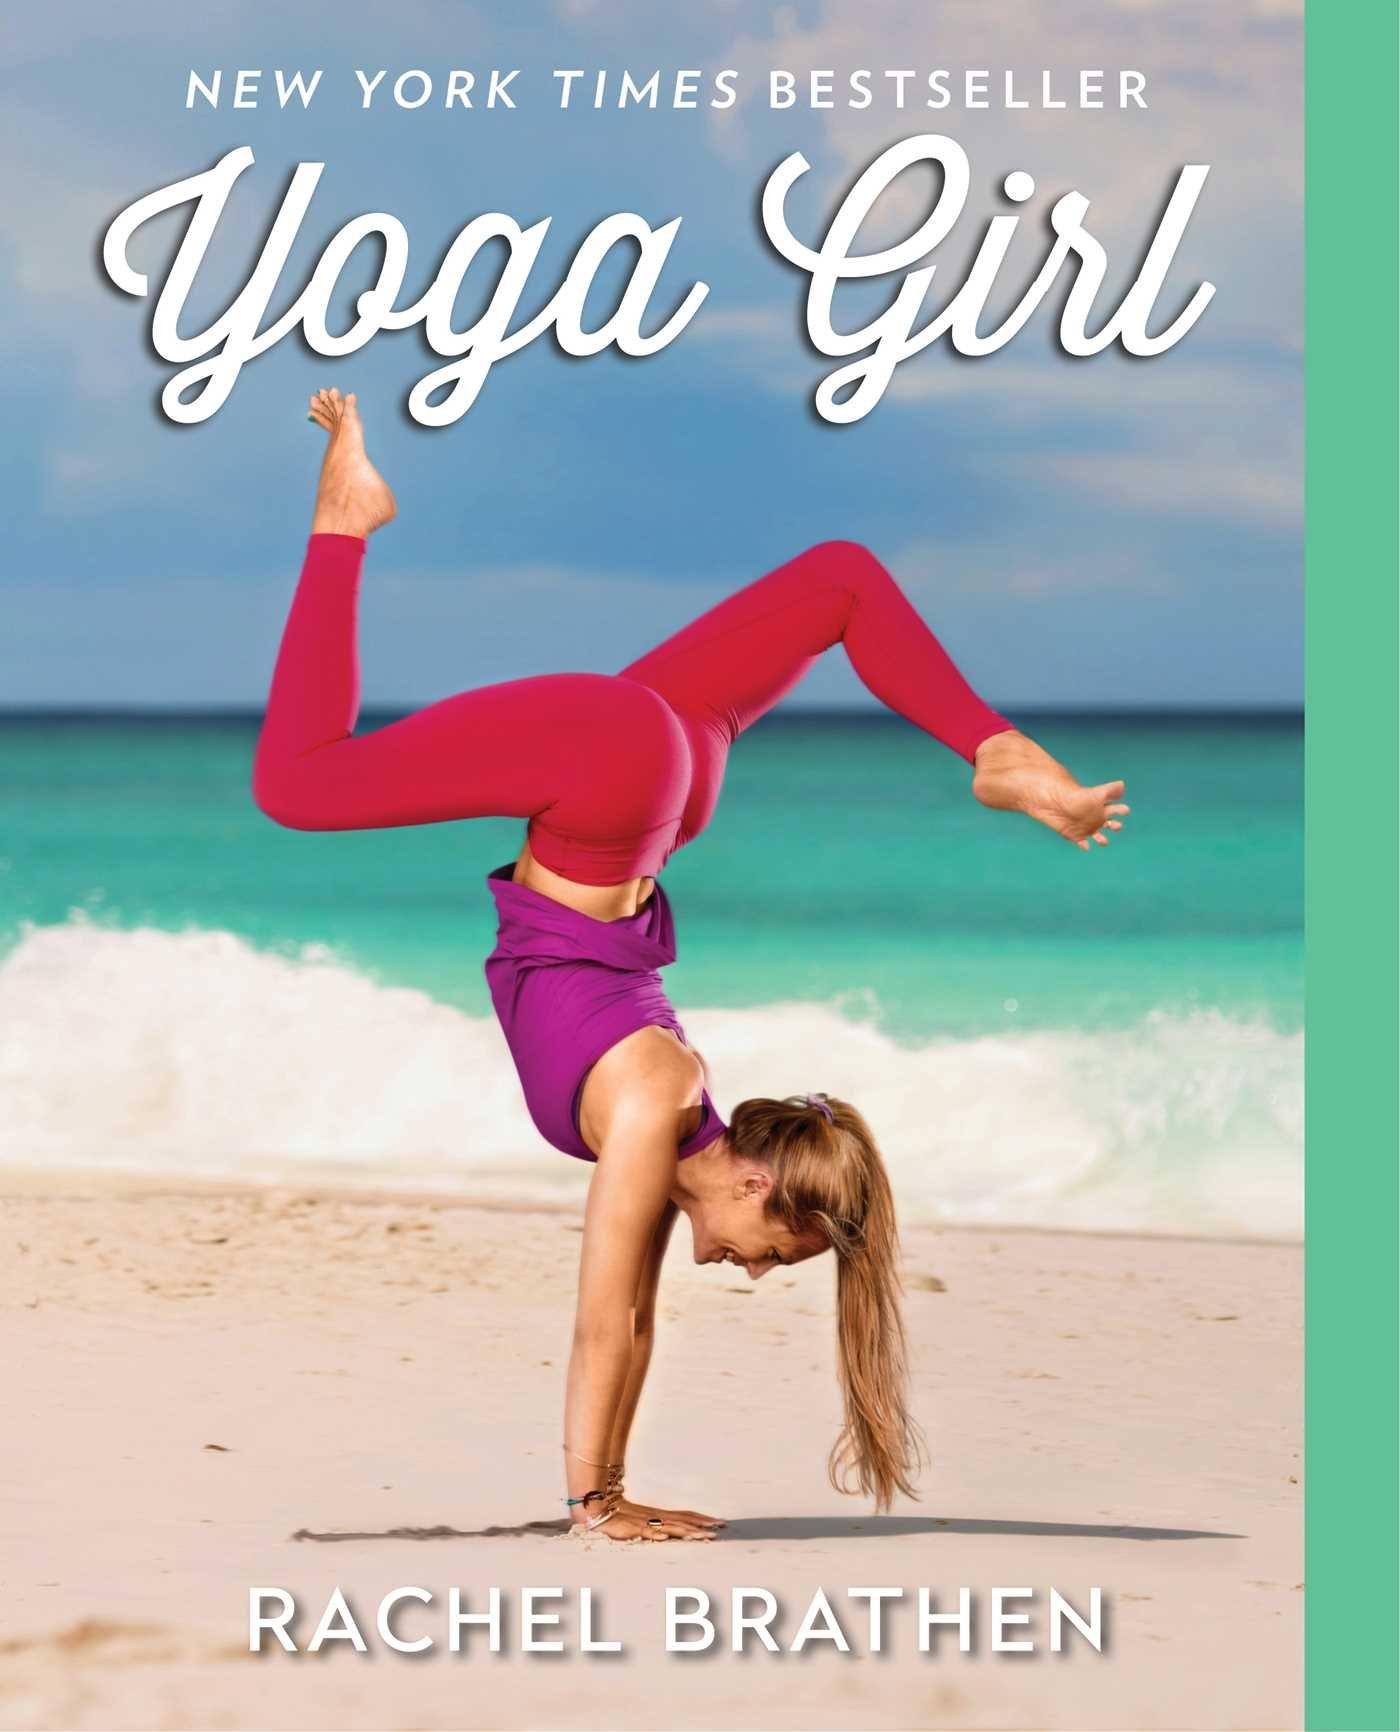 http://www.chicvegan.com/wp-content/uploads/2015/07/Yoga-Girl-by-Rachel-Brathen.jpg